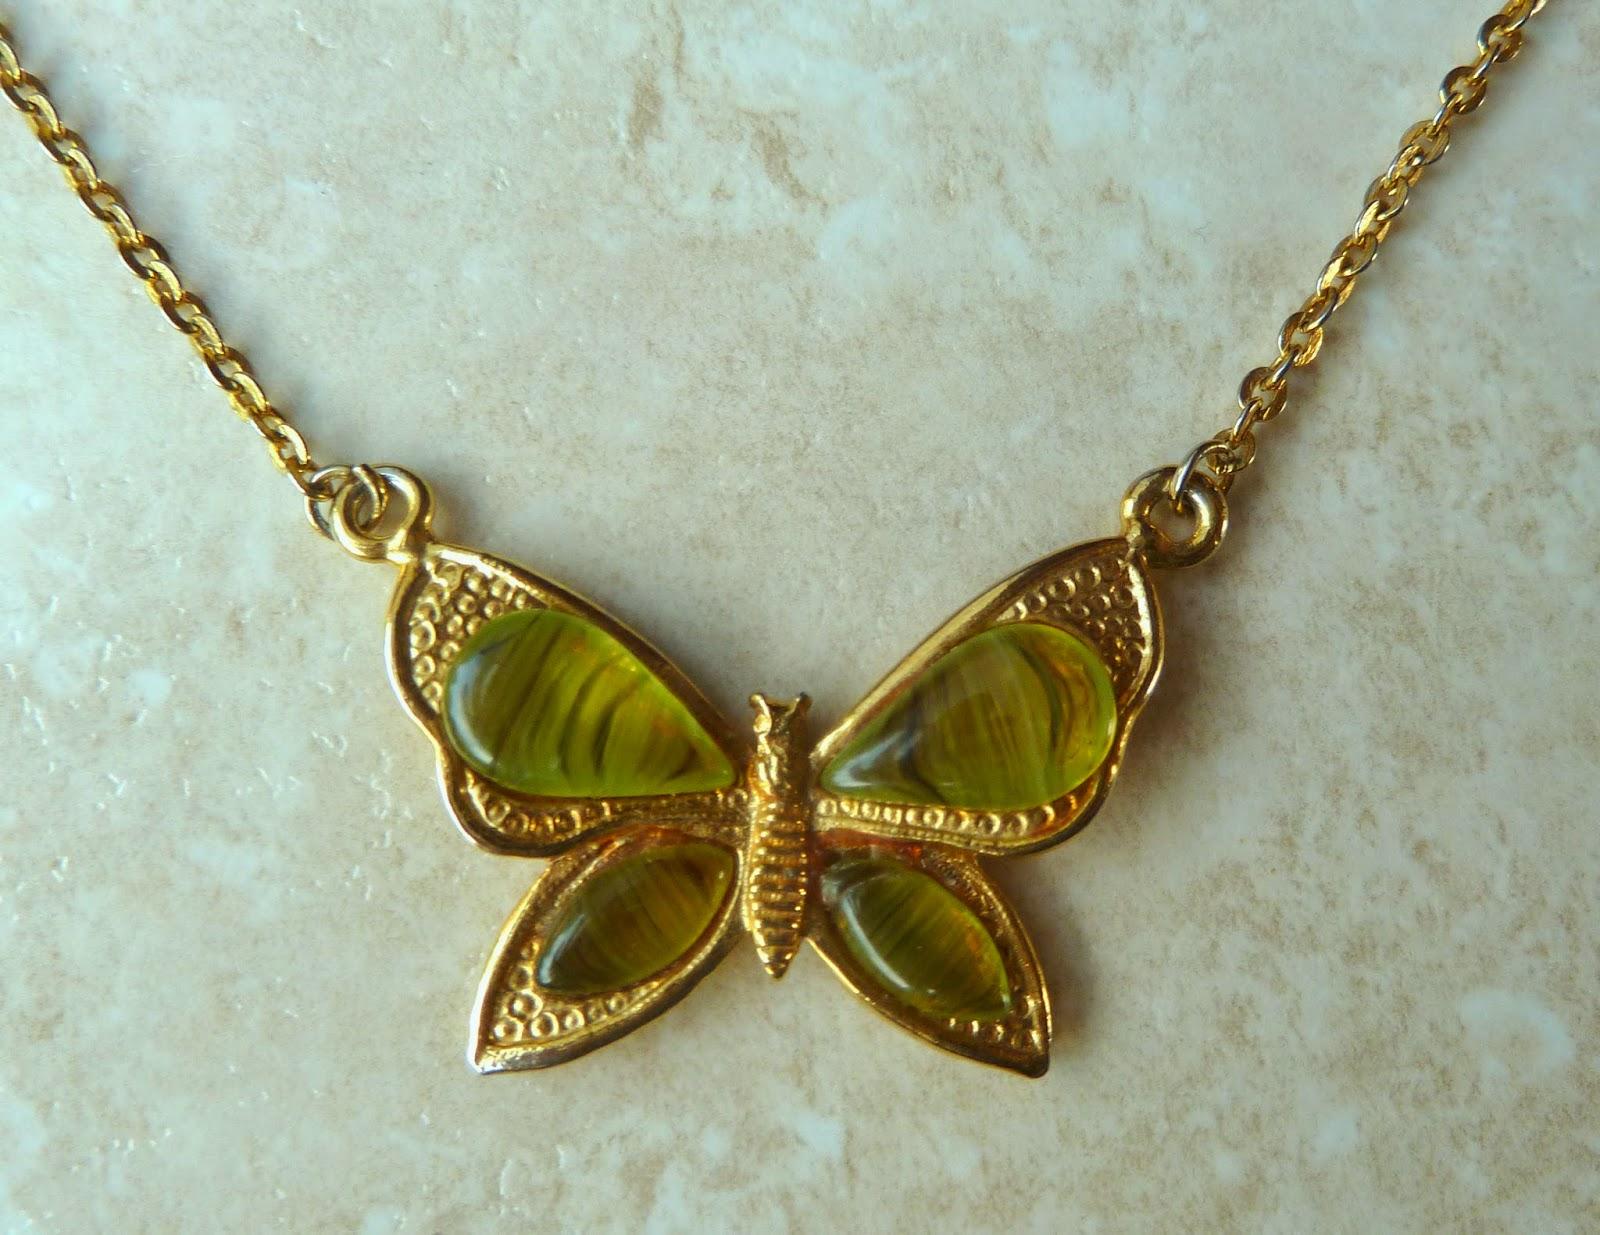 http://www.kcavintagegems.uk/vintage-butterfly-art-glass-choker-necklace-by-exquisite-349-p.asp